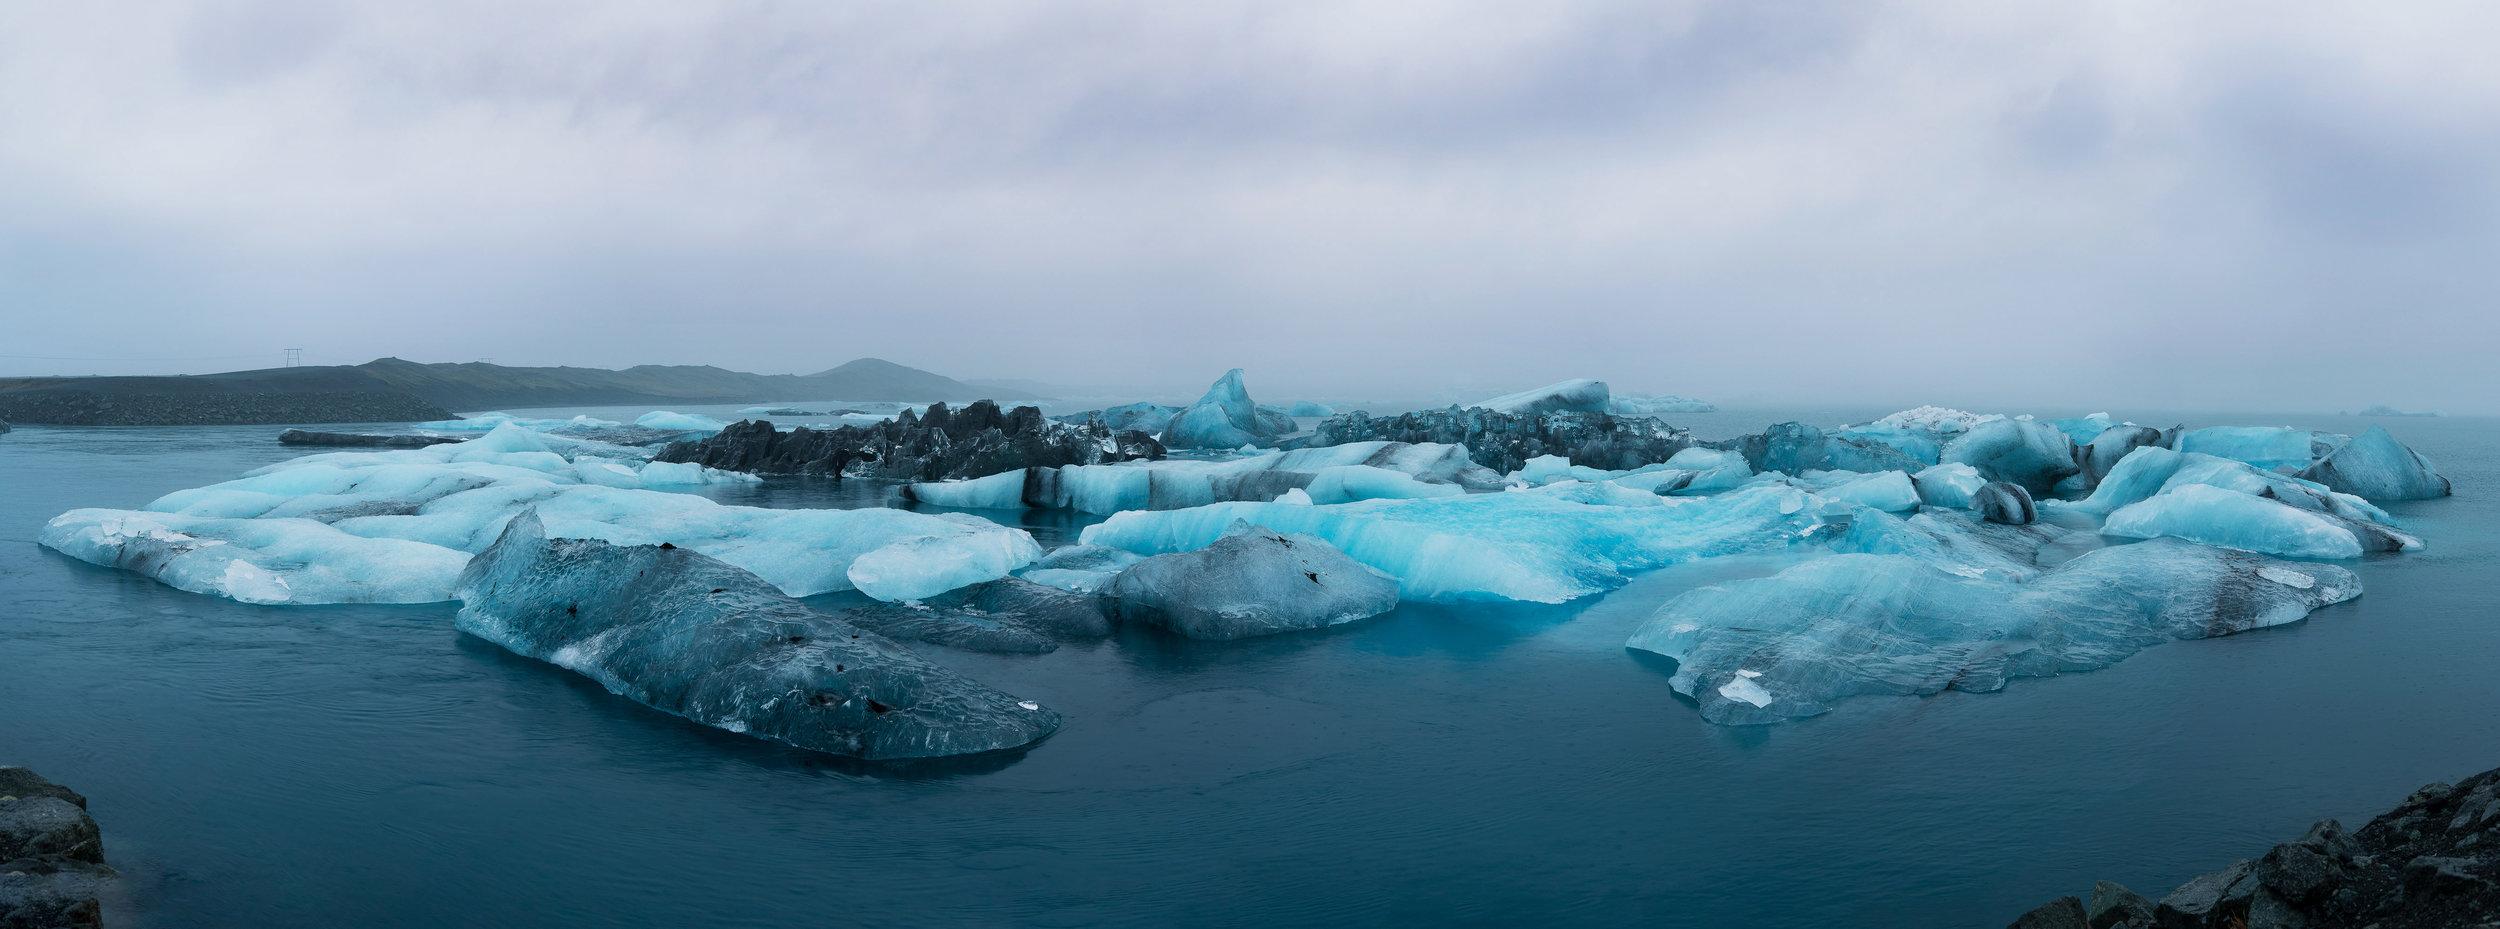 An iceberg cluster at Jökulsárlón